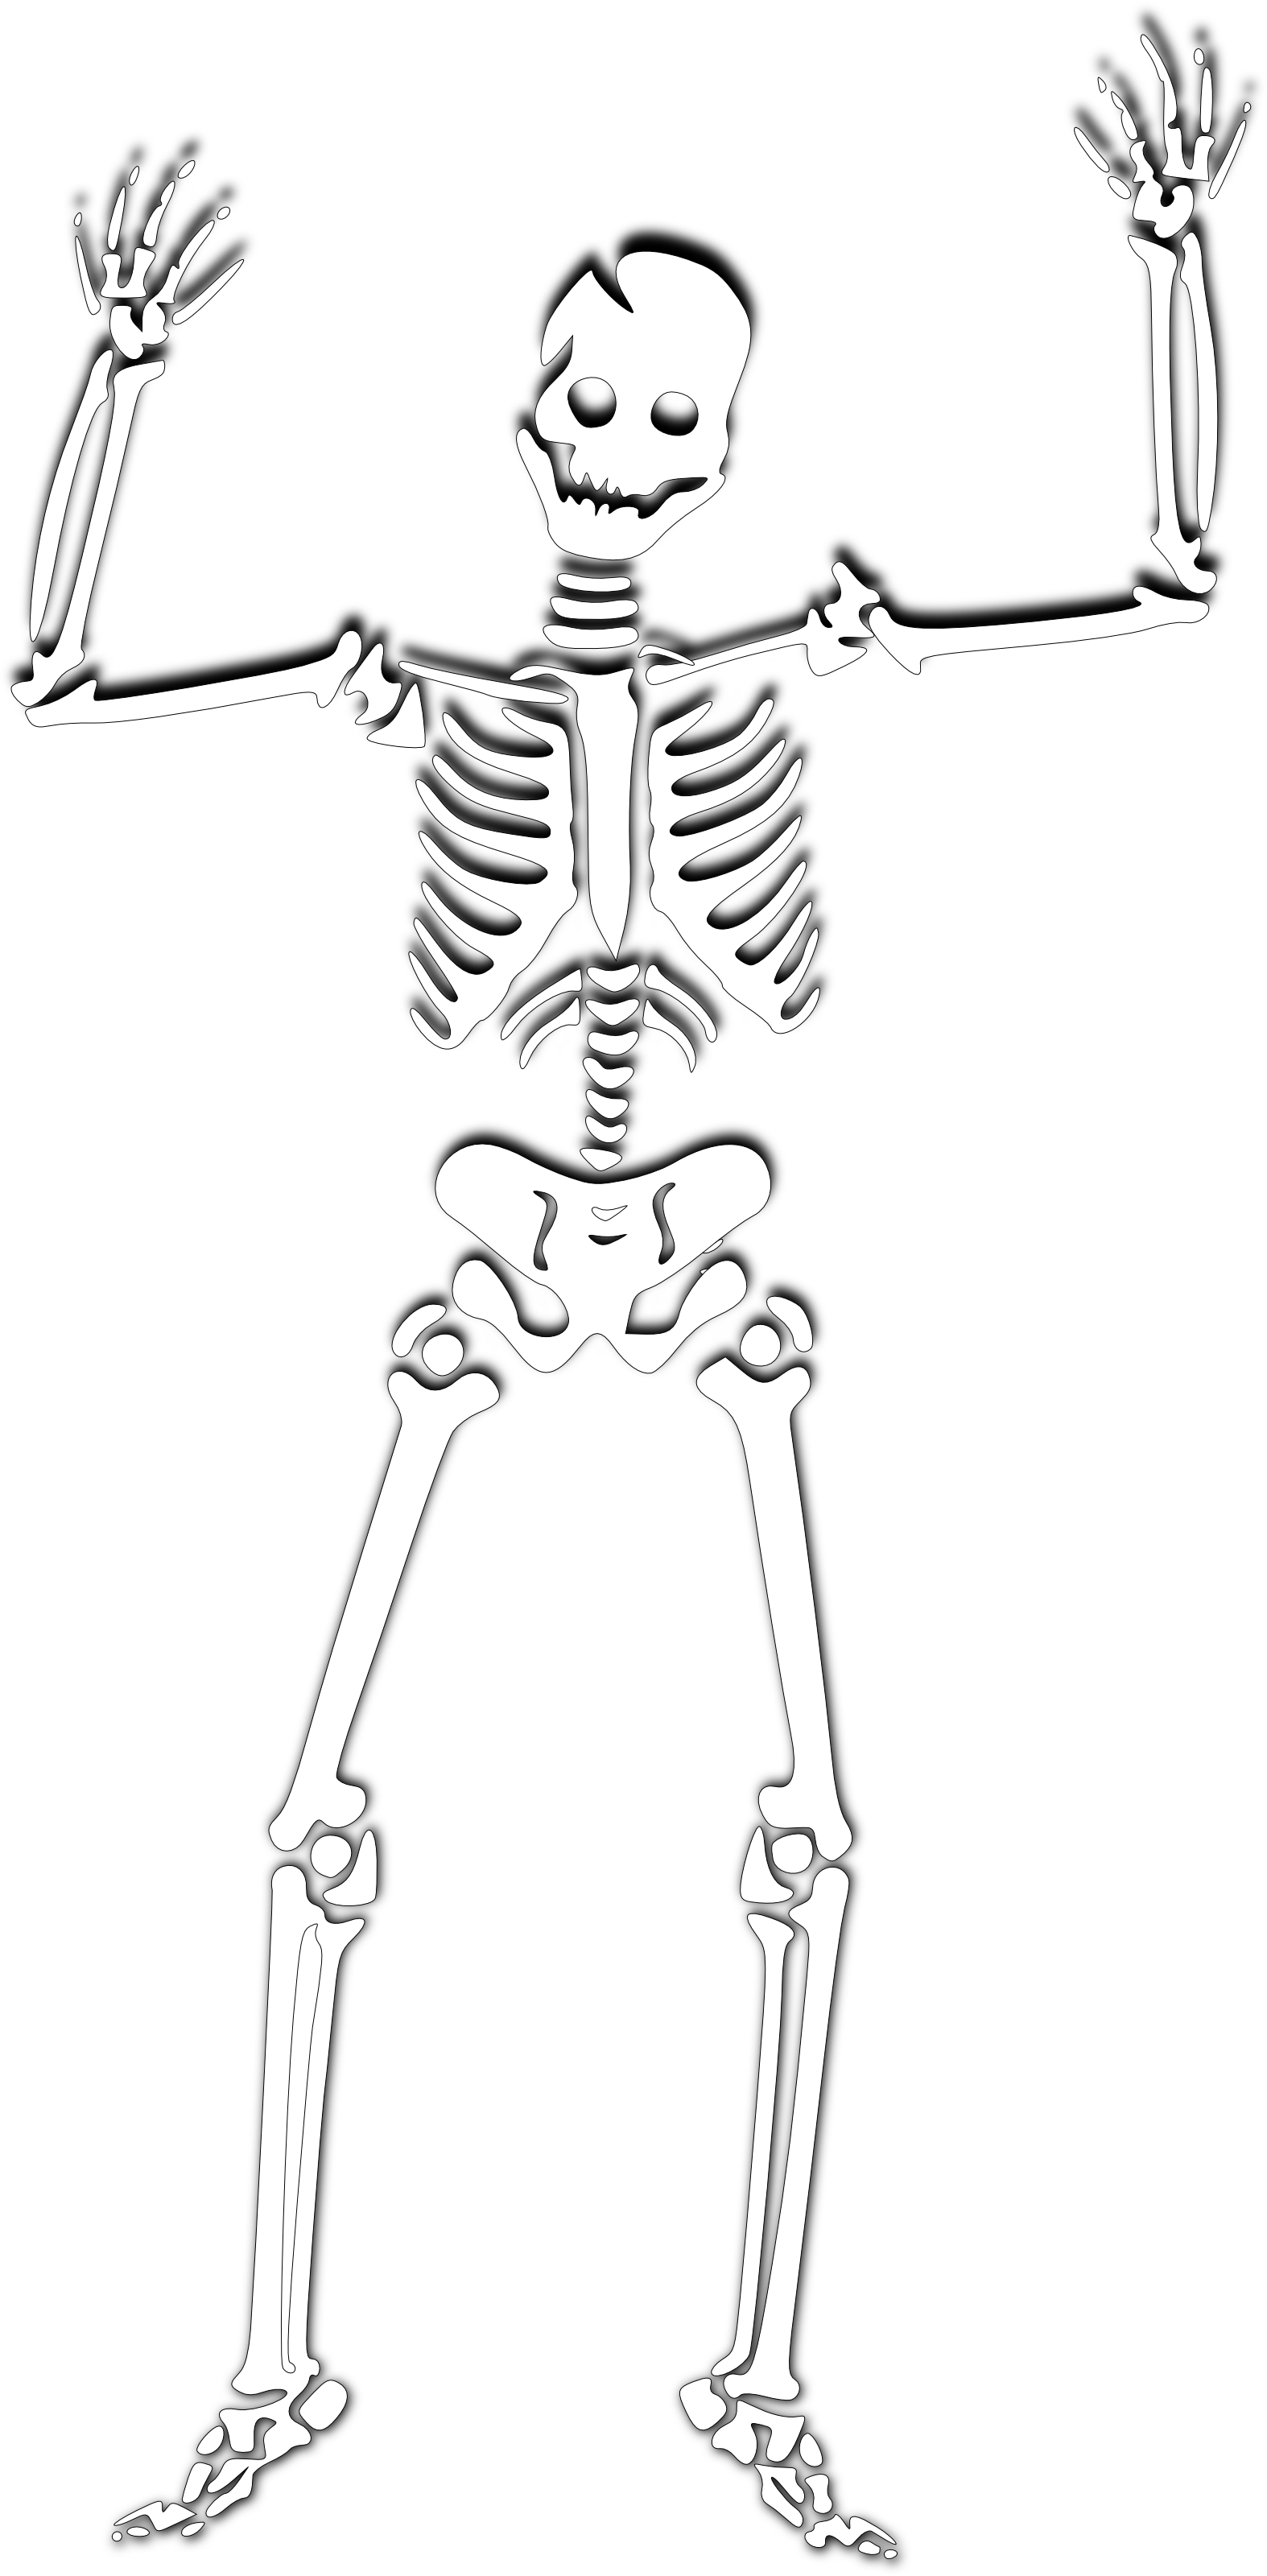 Bones clipart transparent background.  collection of skeleton